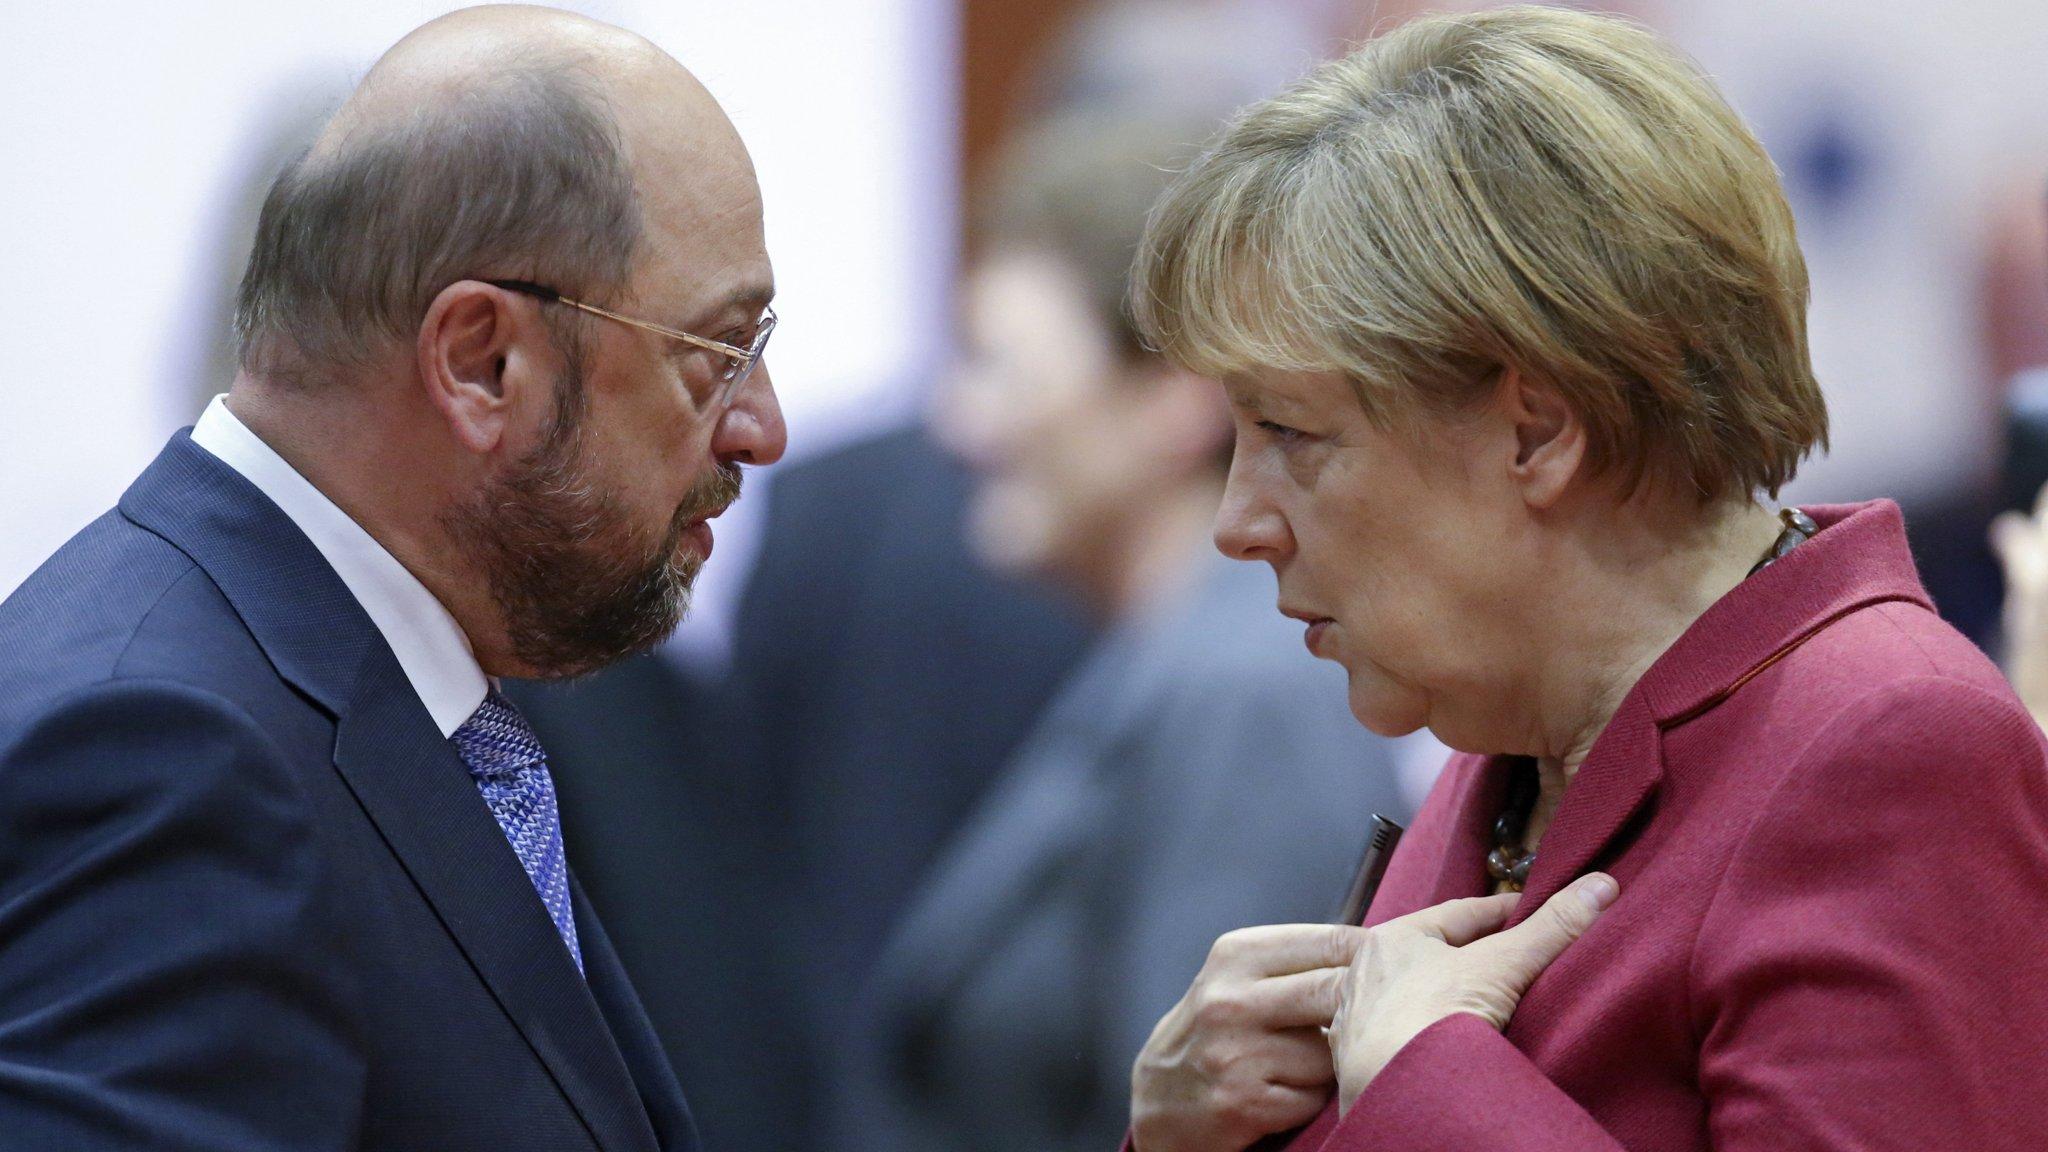 Merkel allies dismiss Schulz's 'United States of Europe' call